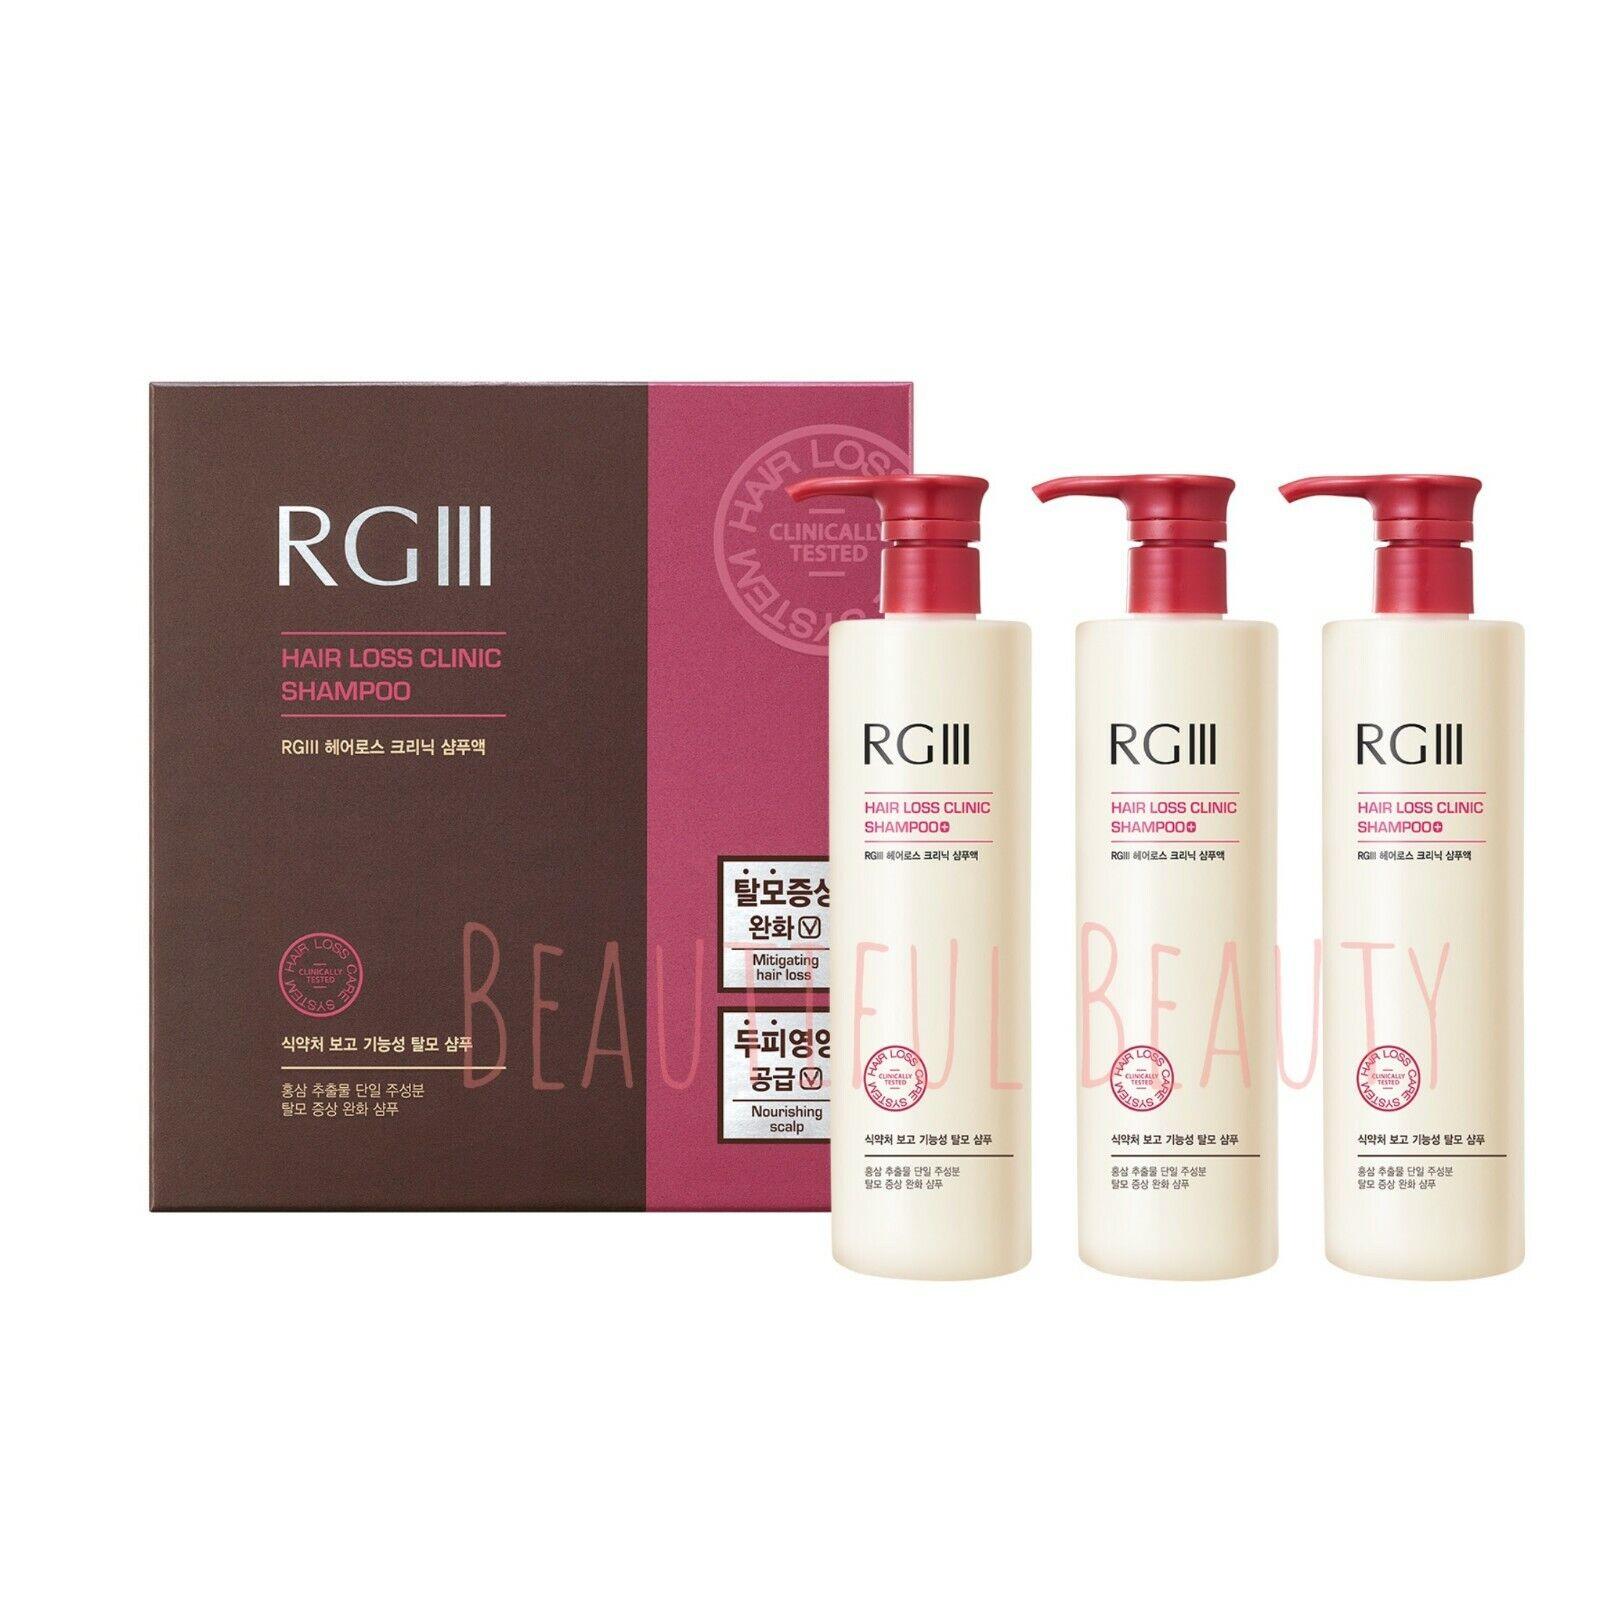 RGIII RG3 Hair Regeneration Hair loss prevention Hair regrow